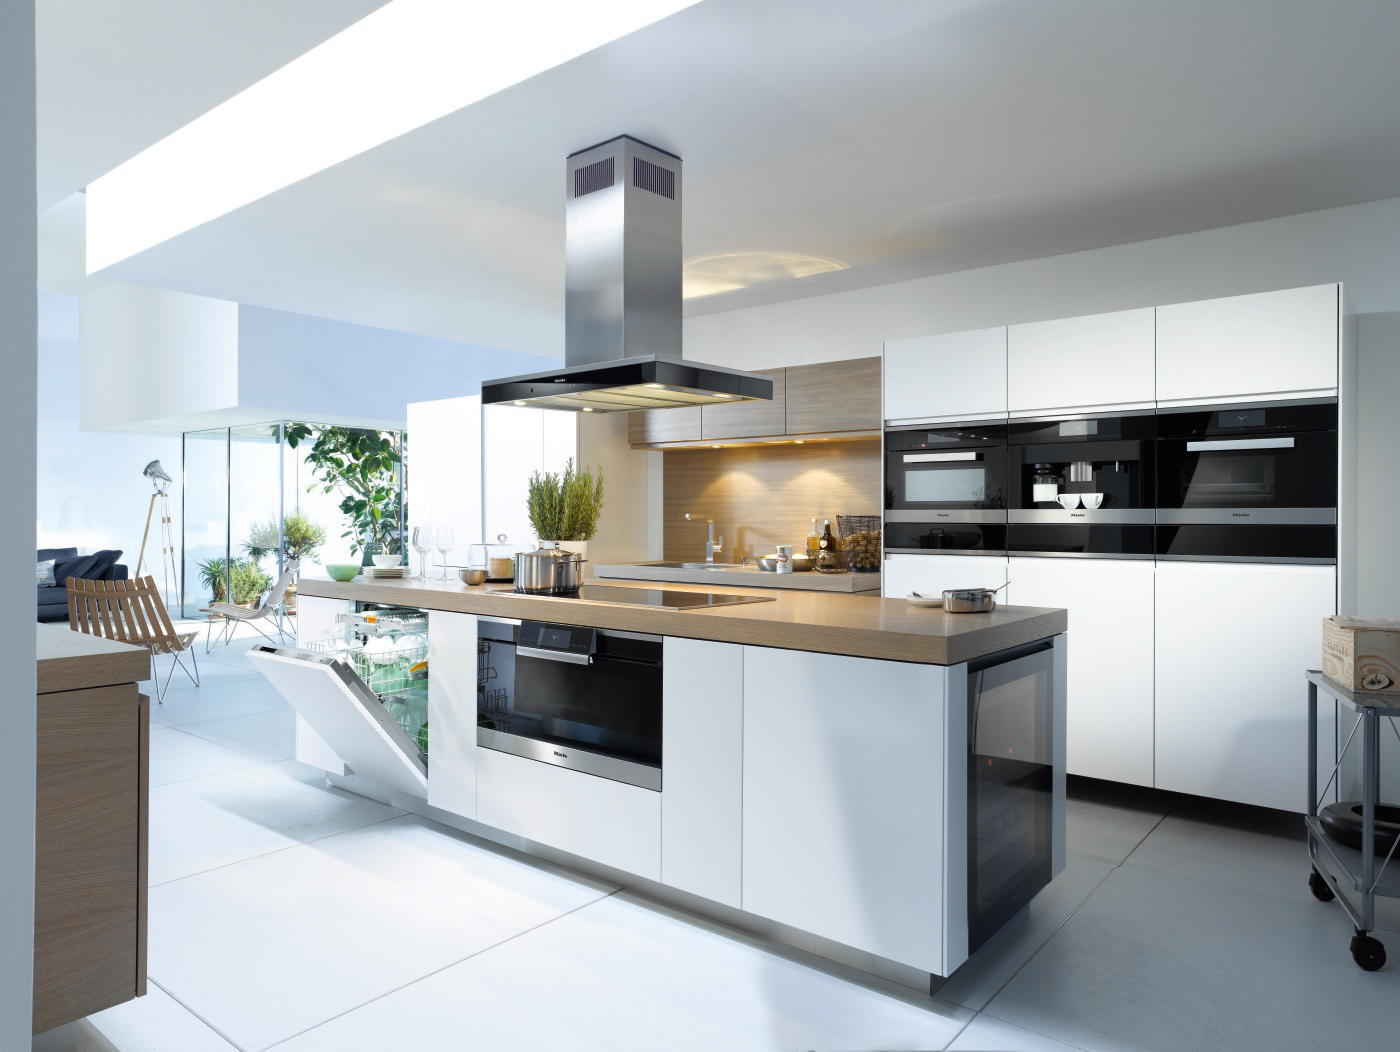 miele steam oven combination miele kitchen appliances. Black Bedroom Furniture Sets. Home Design Ideas